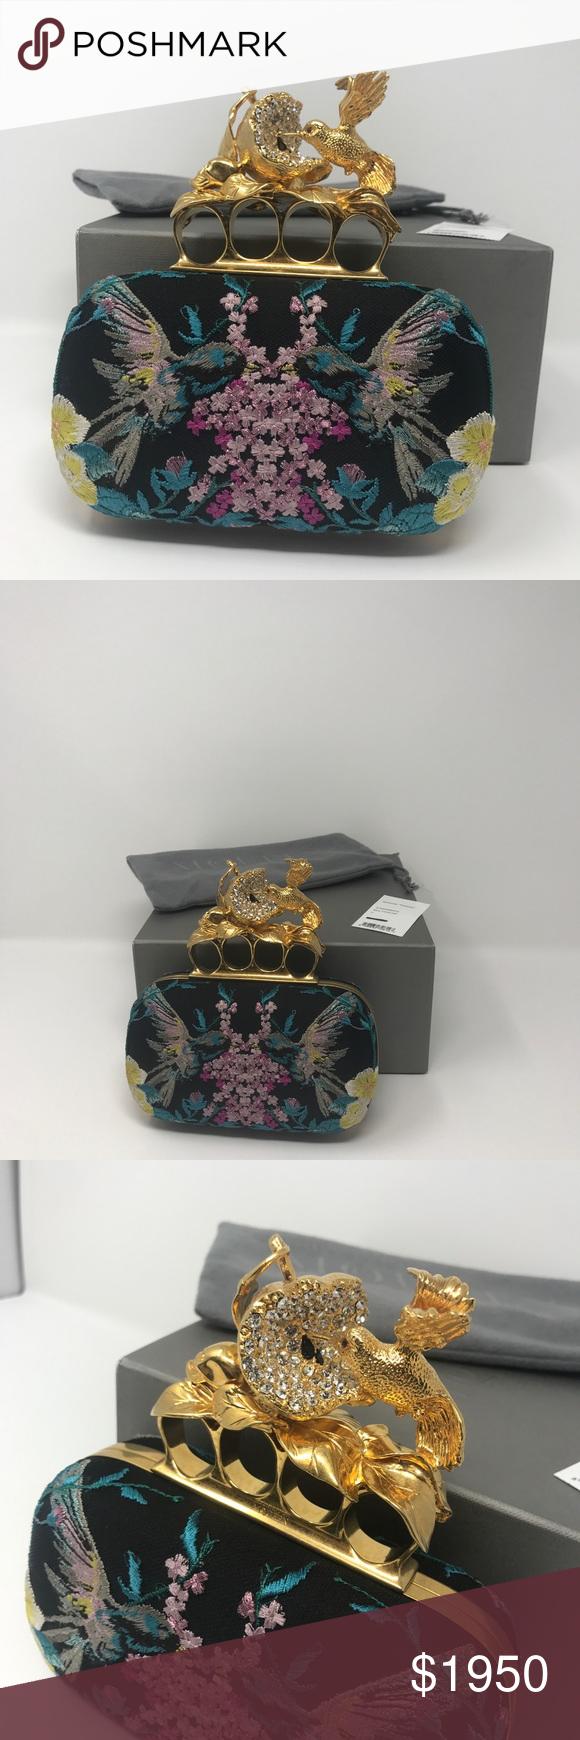 39902b933b1d Alexander McQueen Clutch Beautiful Apple and Hummingbird knuckle-duster.  Holder signature McQueen hinged brass